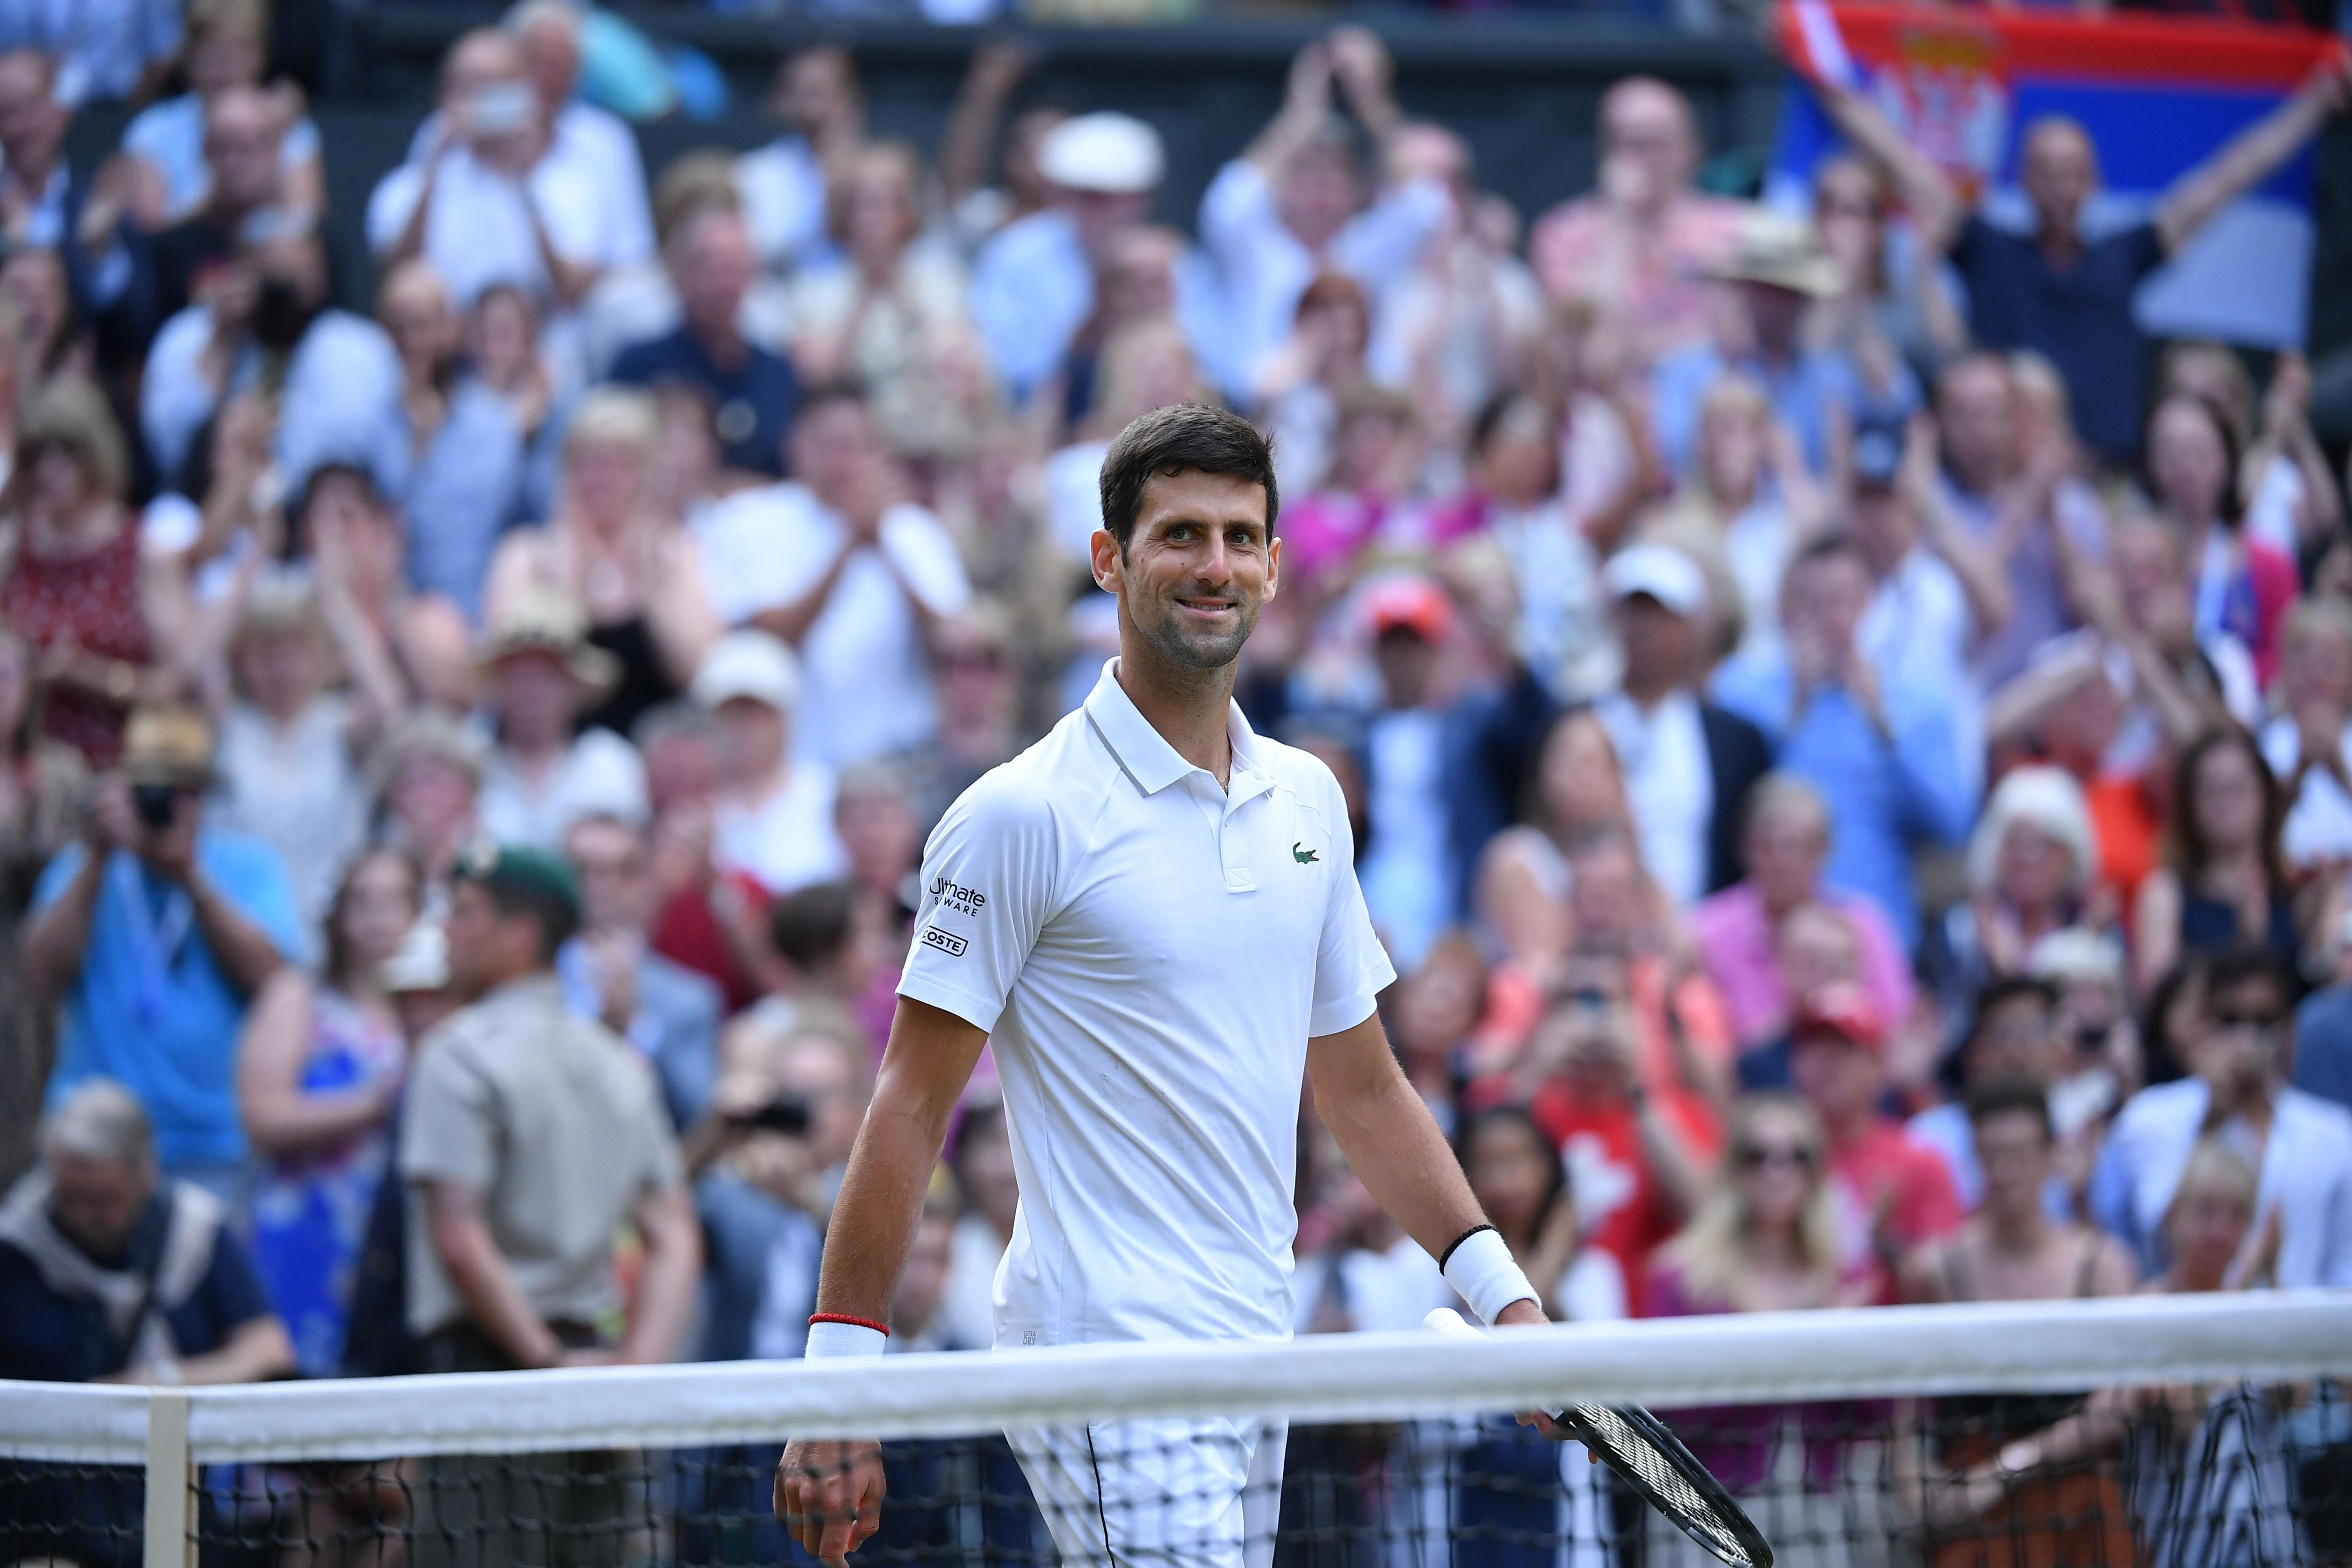 Tennis - Wimbledon - Wimbledon: Djokovic ne connaissait pas la règle du super tie-break